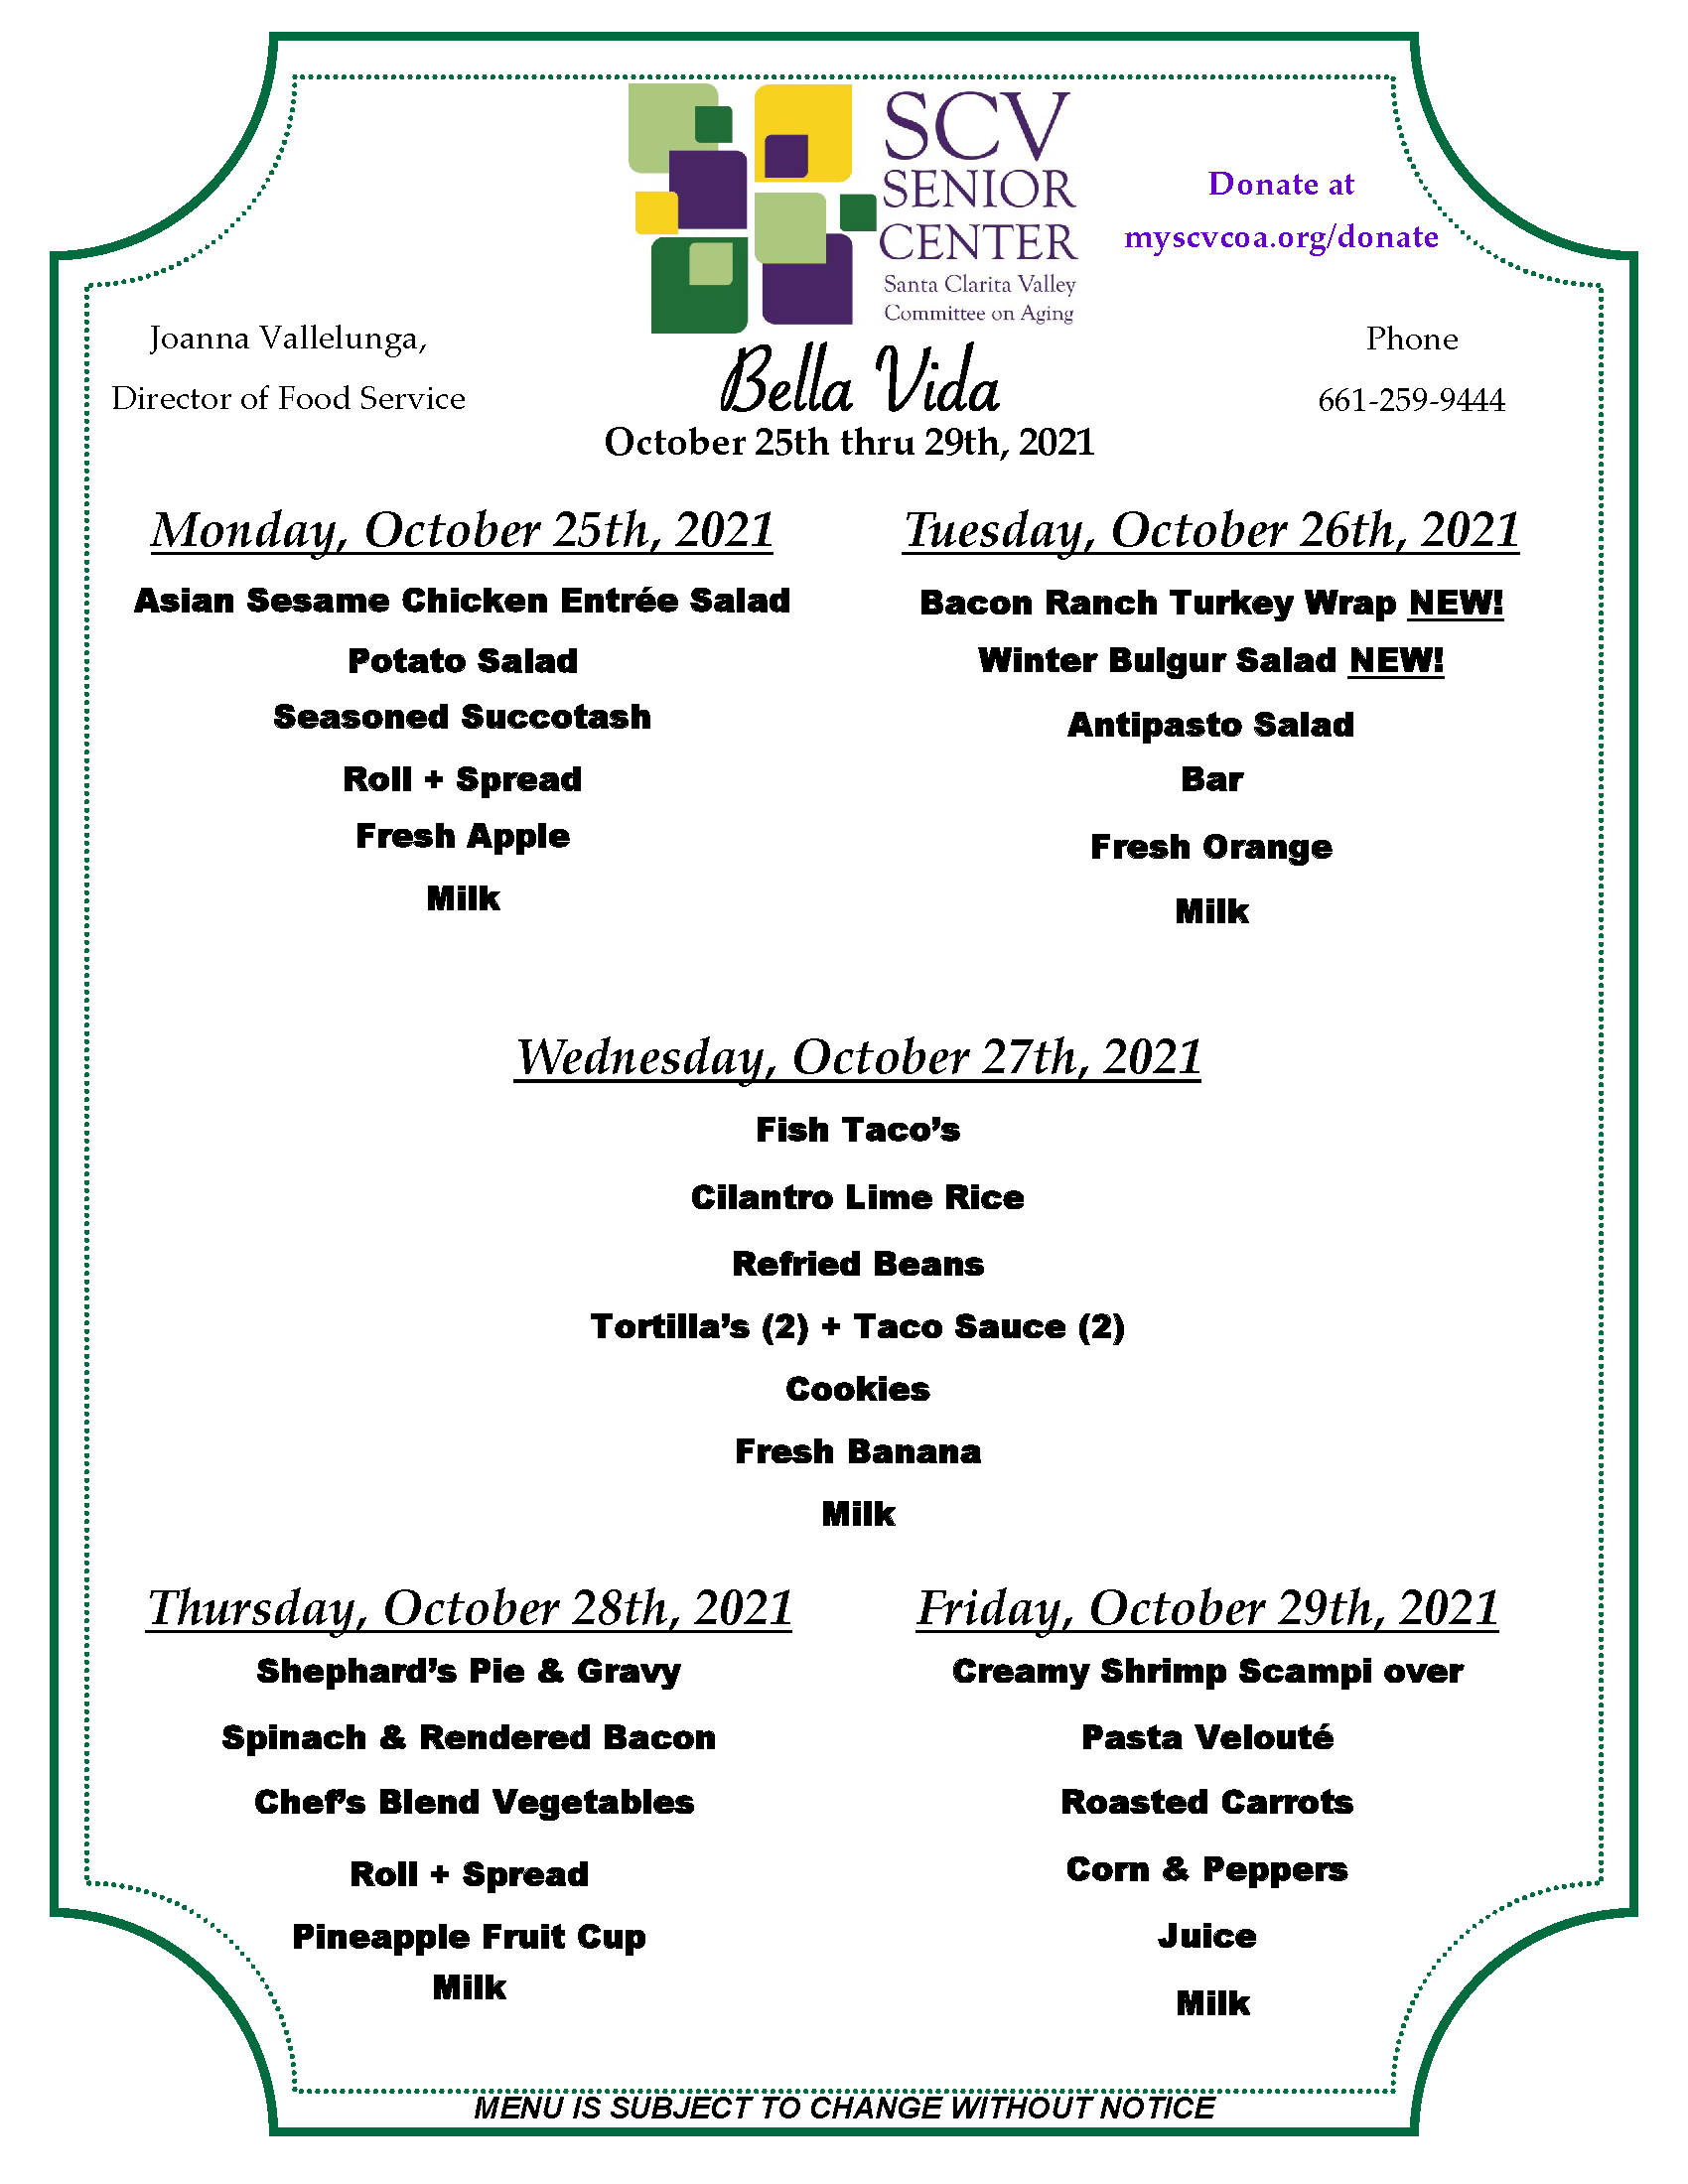 October 25th thru 29th menu